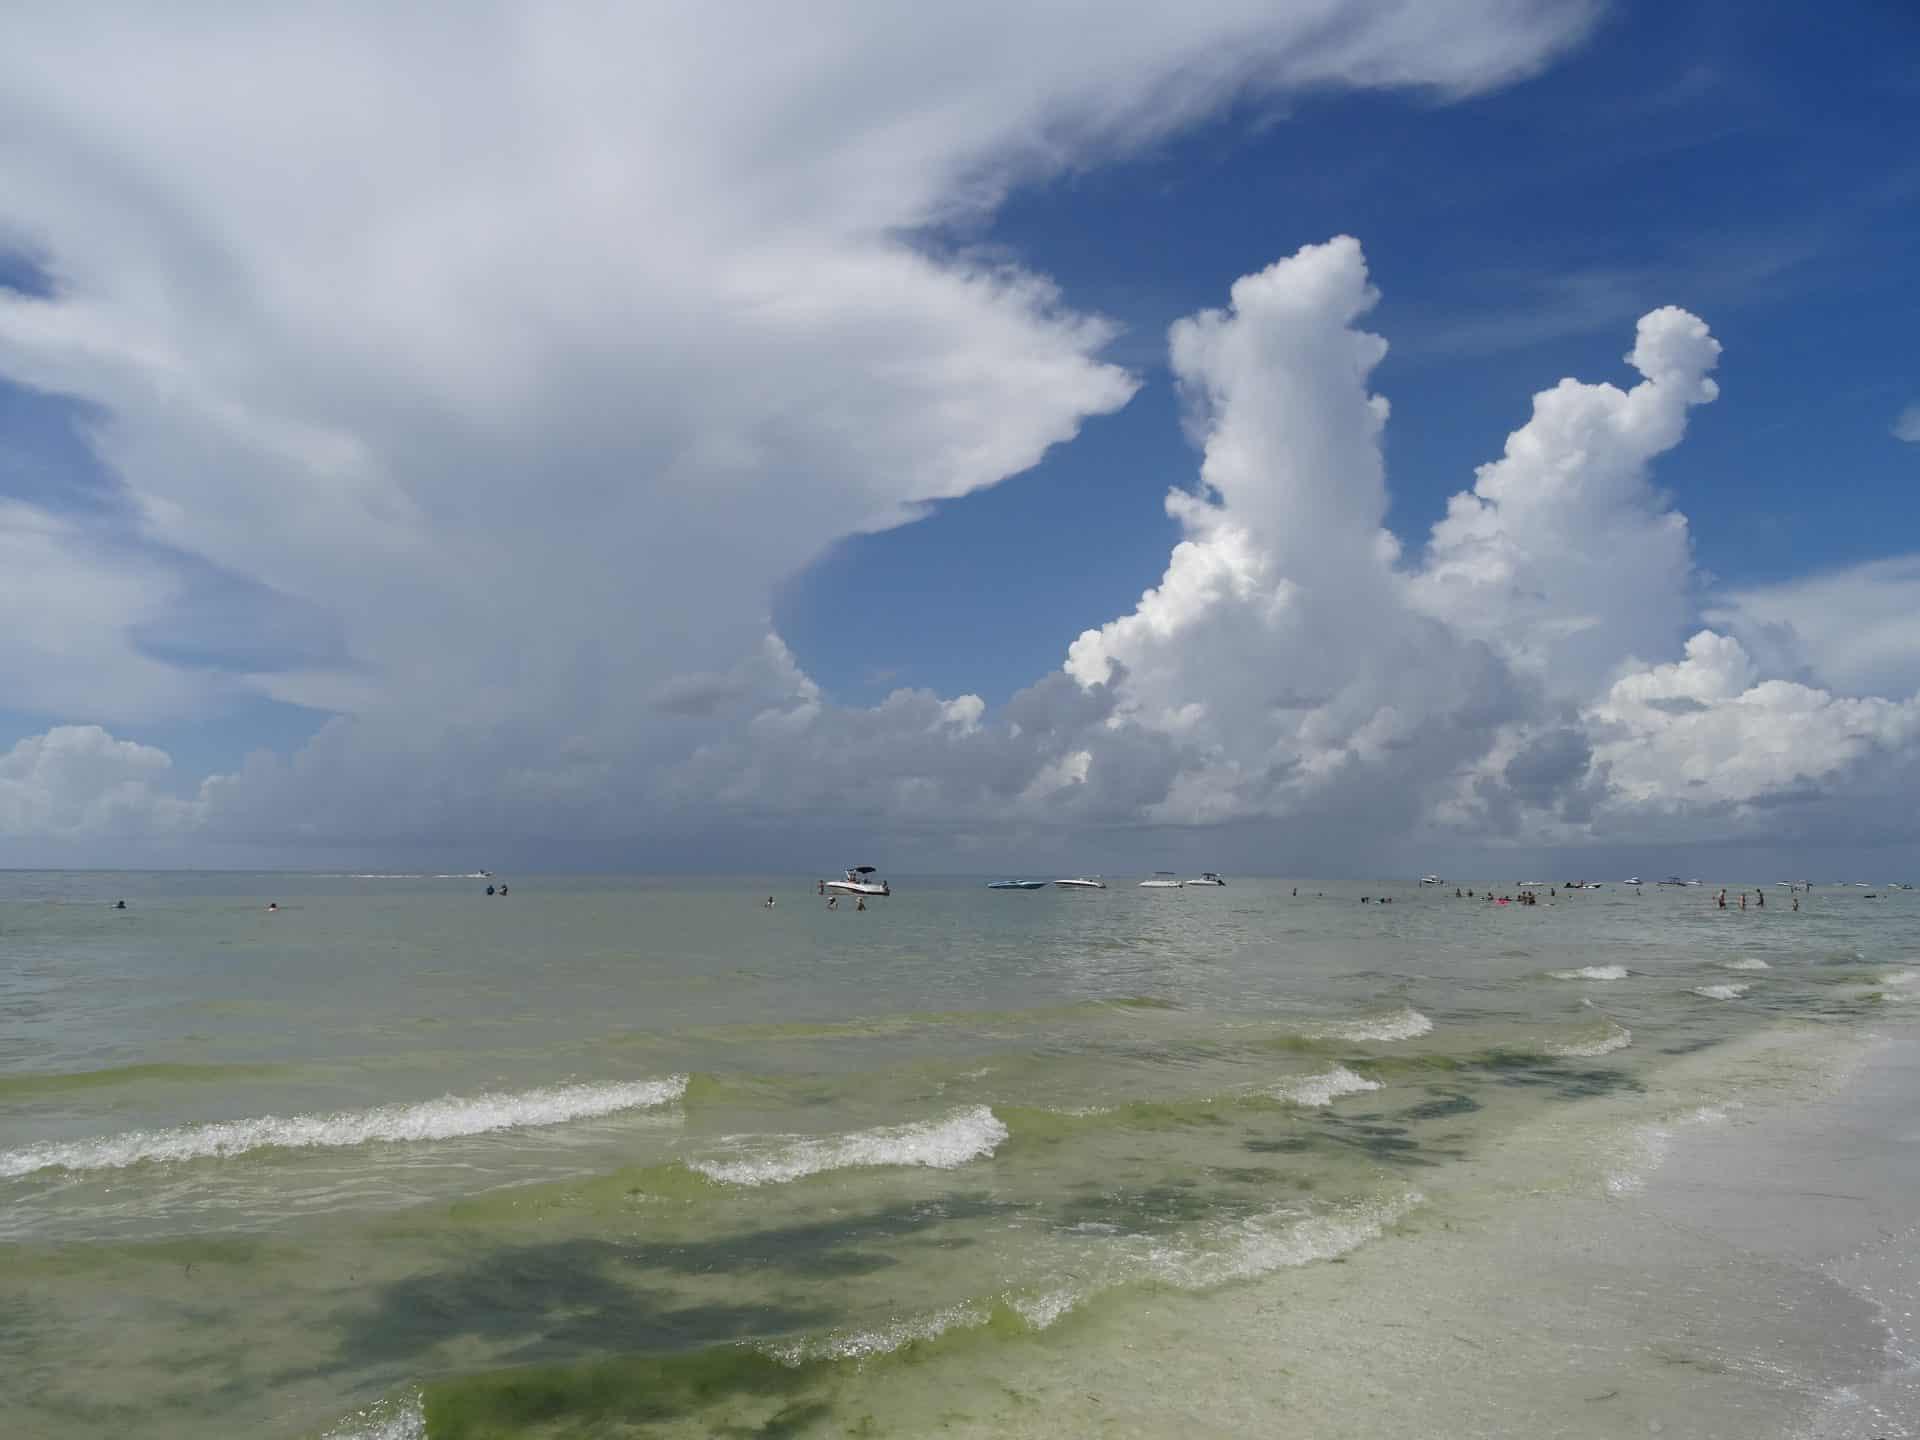 îles de Sanibel et Captiva road trip Floride